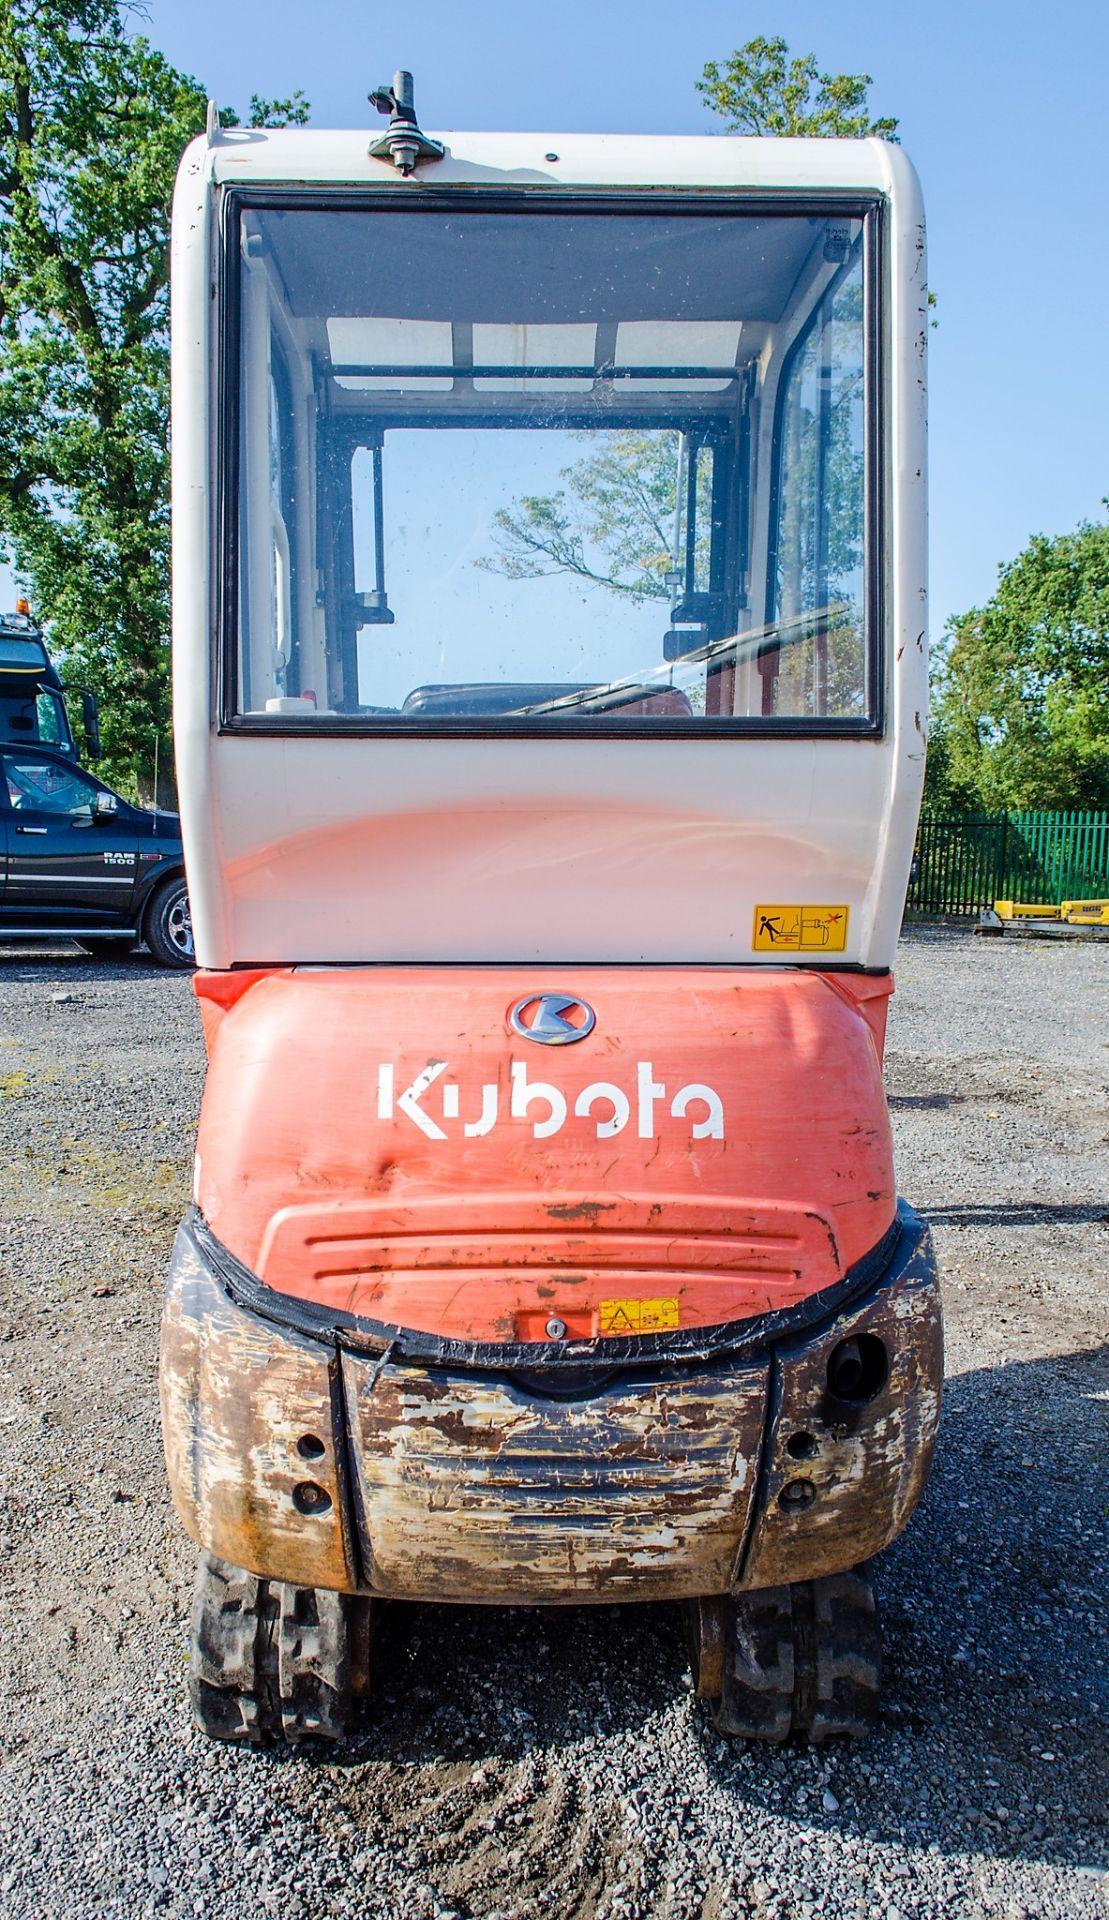 Kubota KX36-3 1.5 tonne rubber tracked mini excavator Year: 2007 S/N: Z077298 Recorded Hours: 4205 - Image 6 of 18